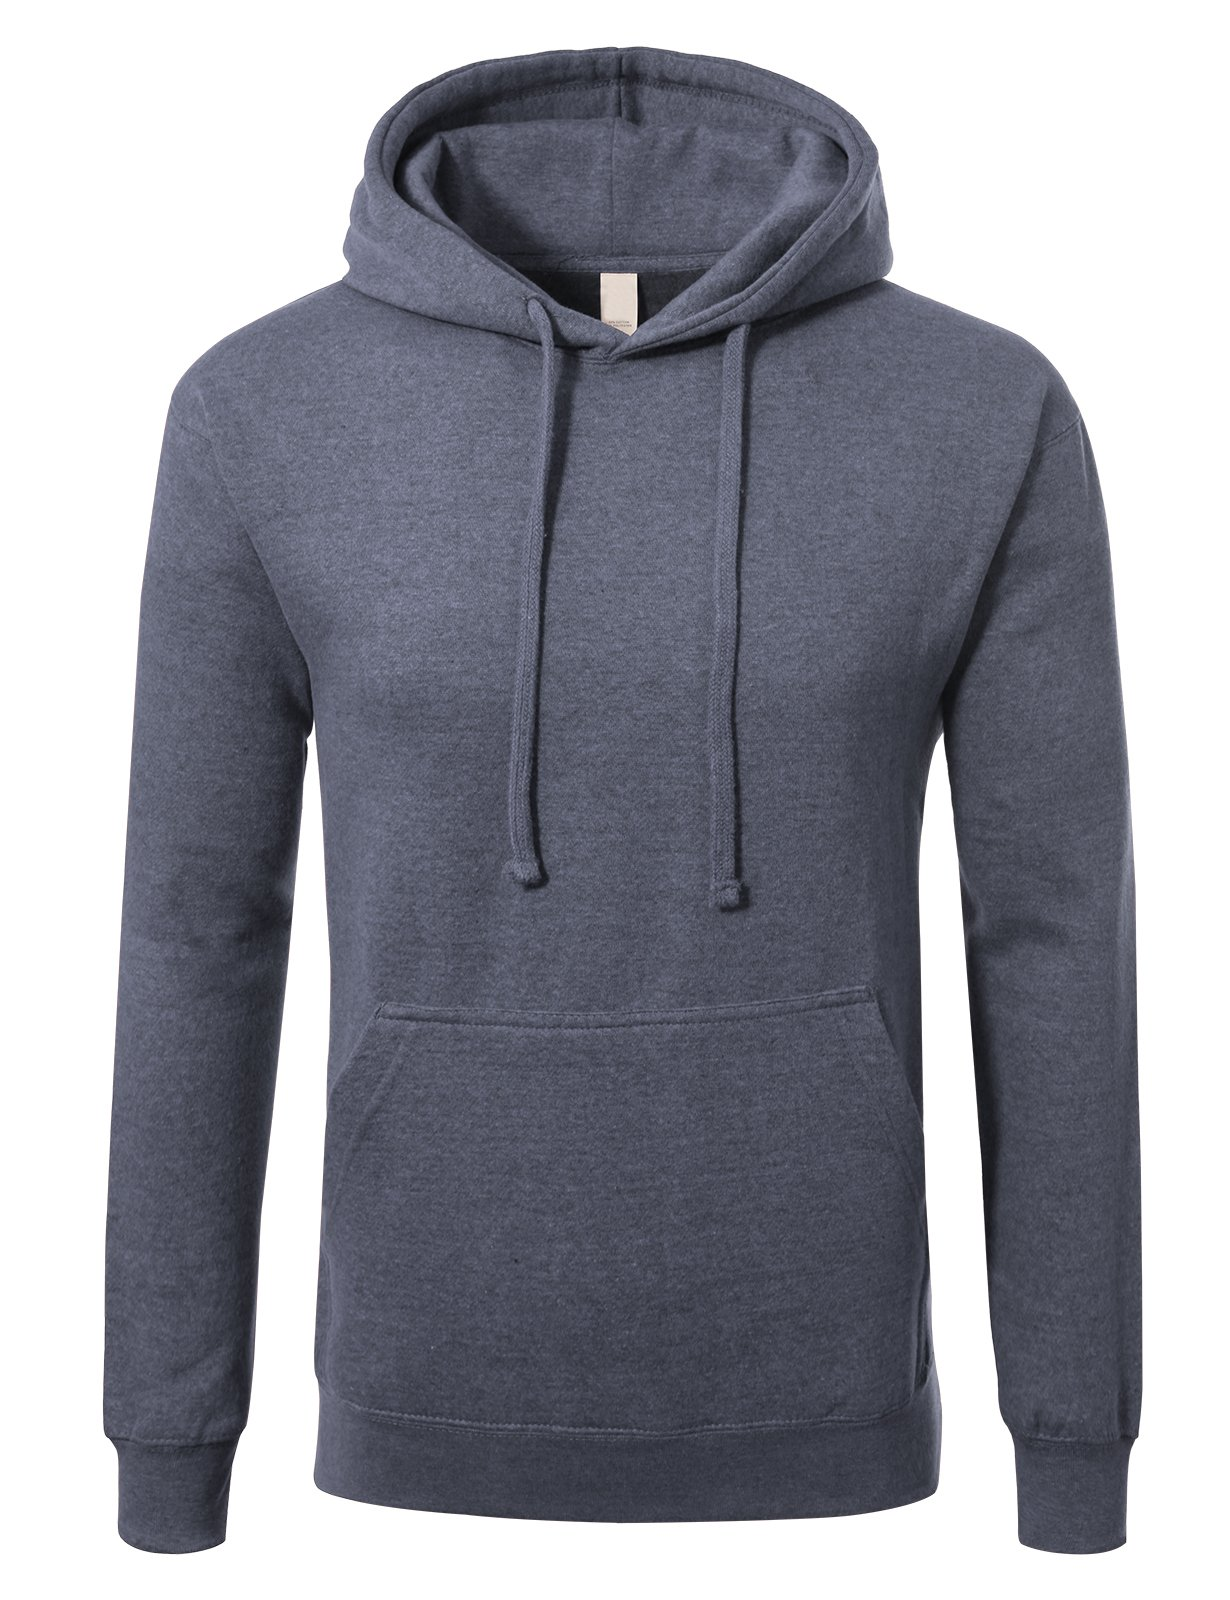 e1b40cd2e Galleon - JD Apparel Men's Premium Heavyweight Pullover Hoodie Sweatshirt M  Heather Navy